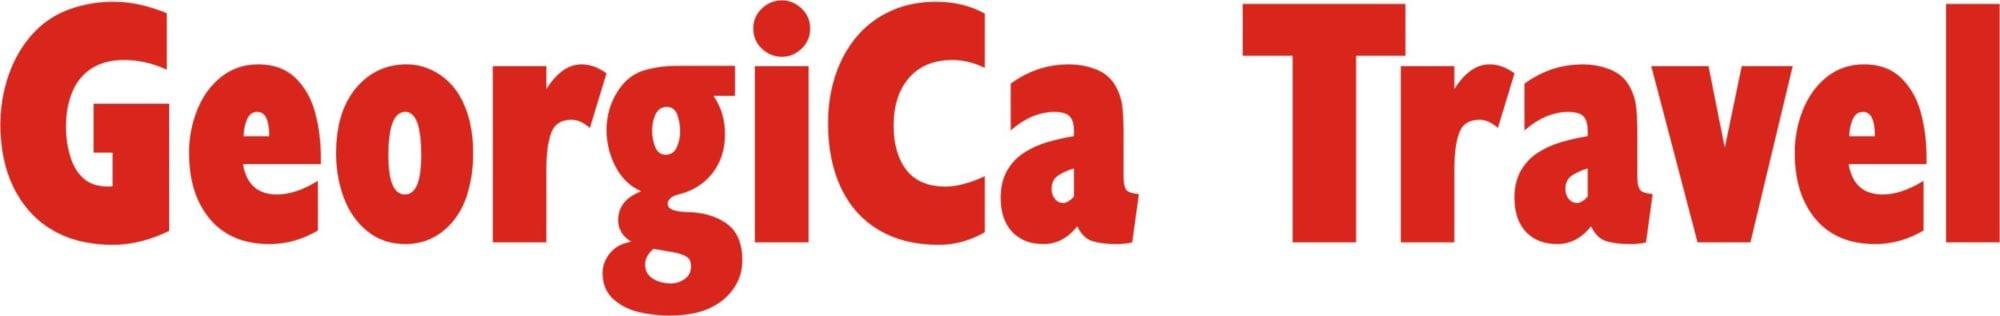 georgicatravel-logo